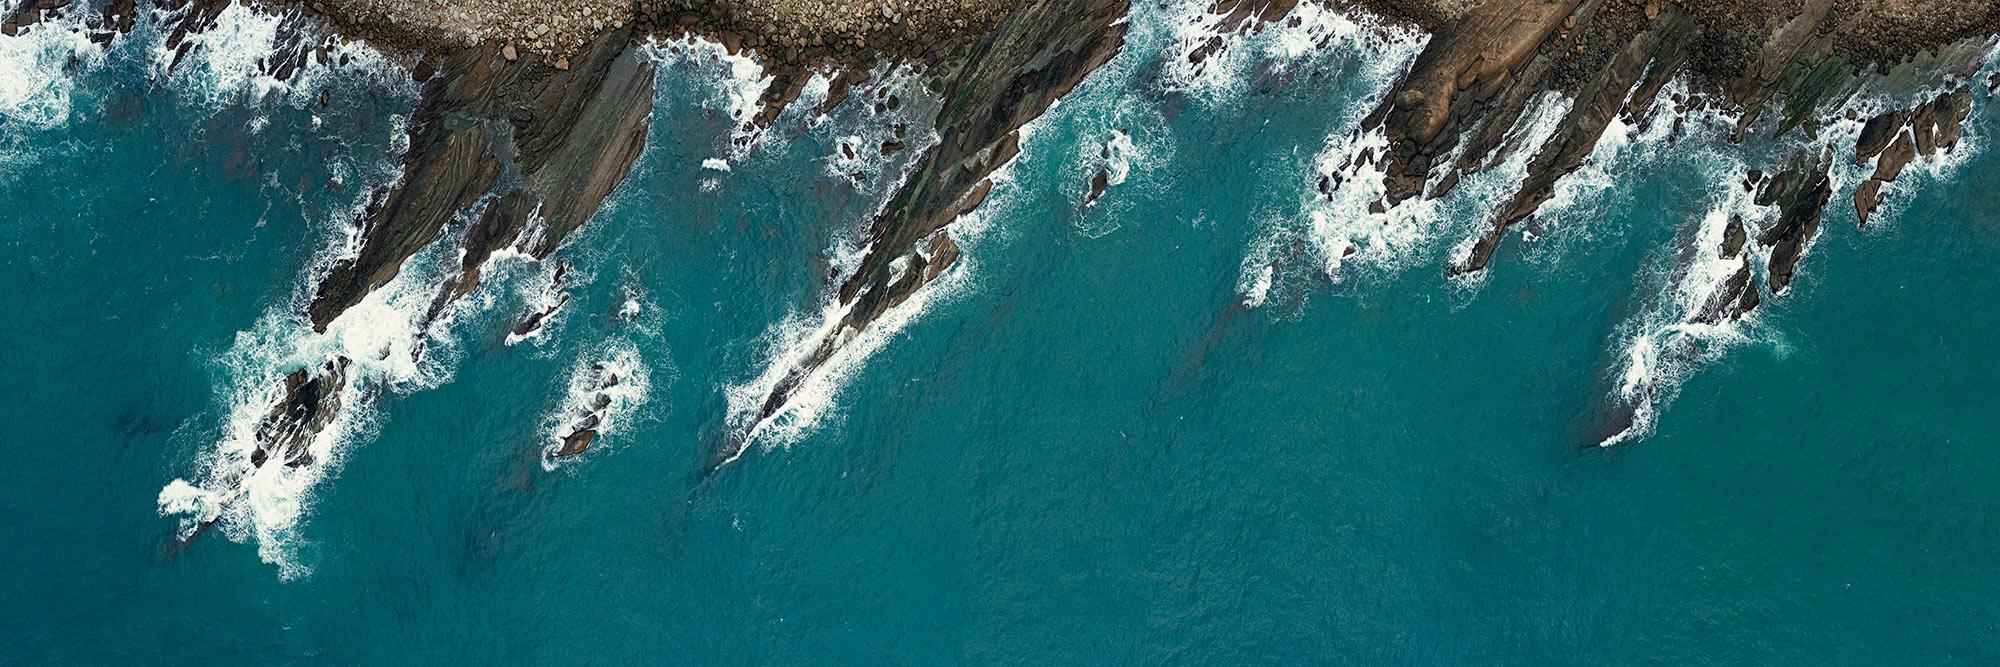 jagged rocky coast drone